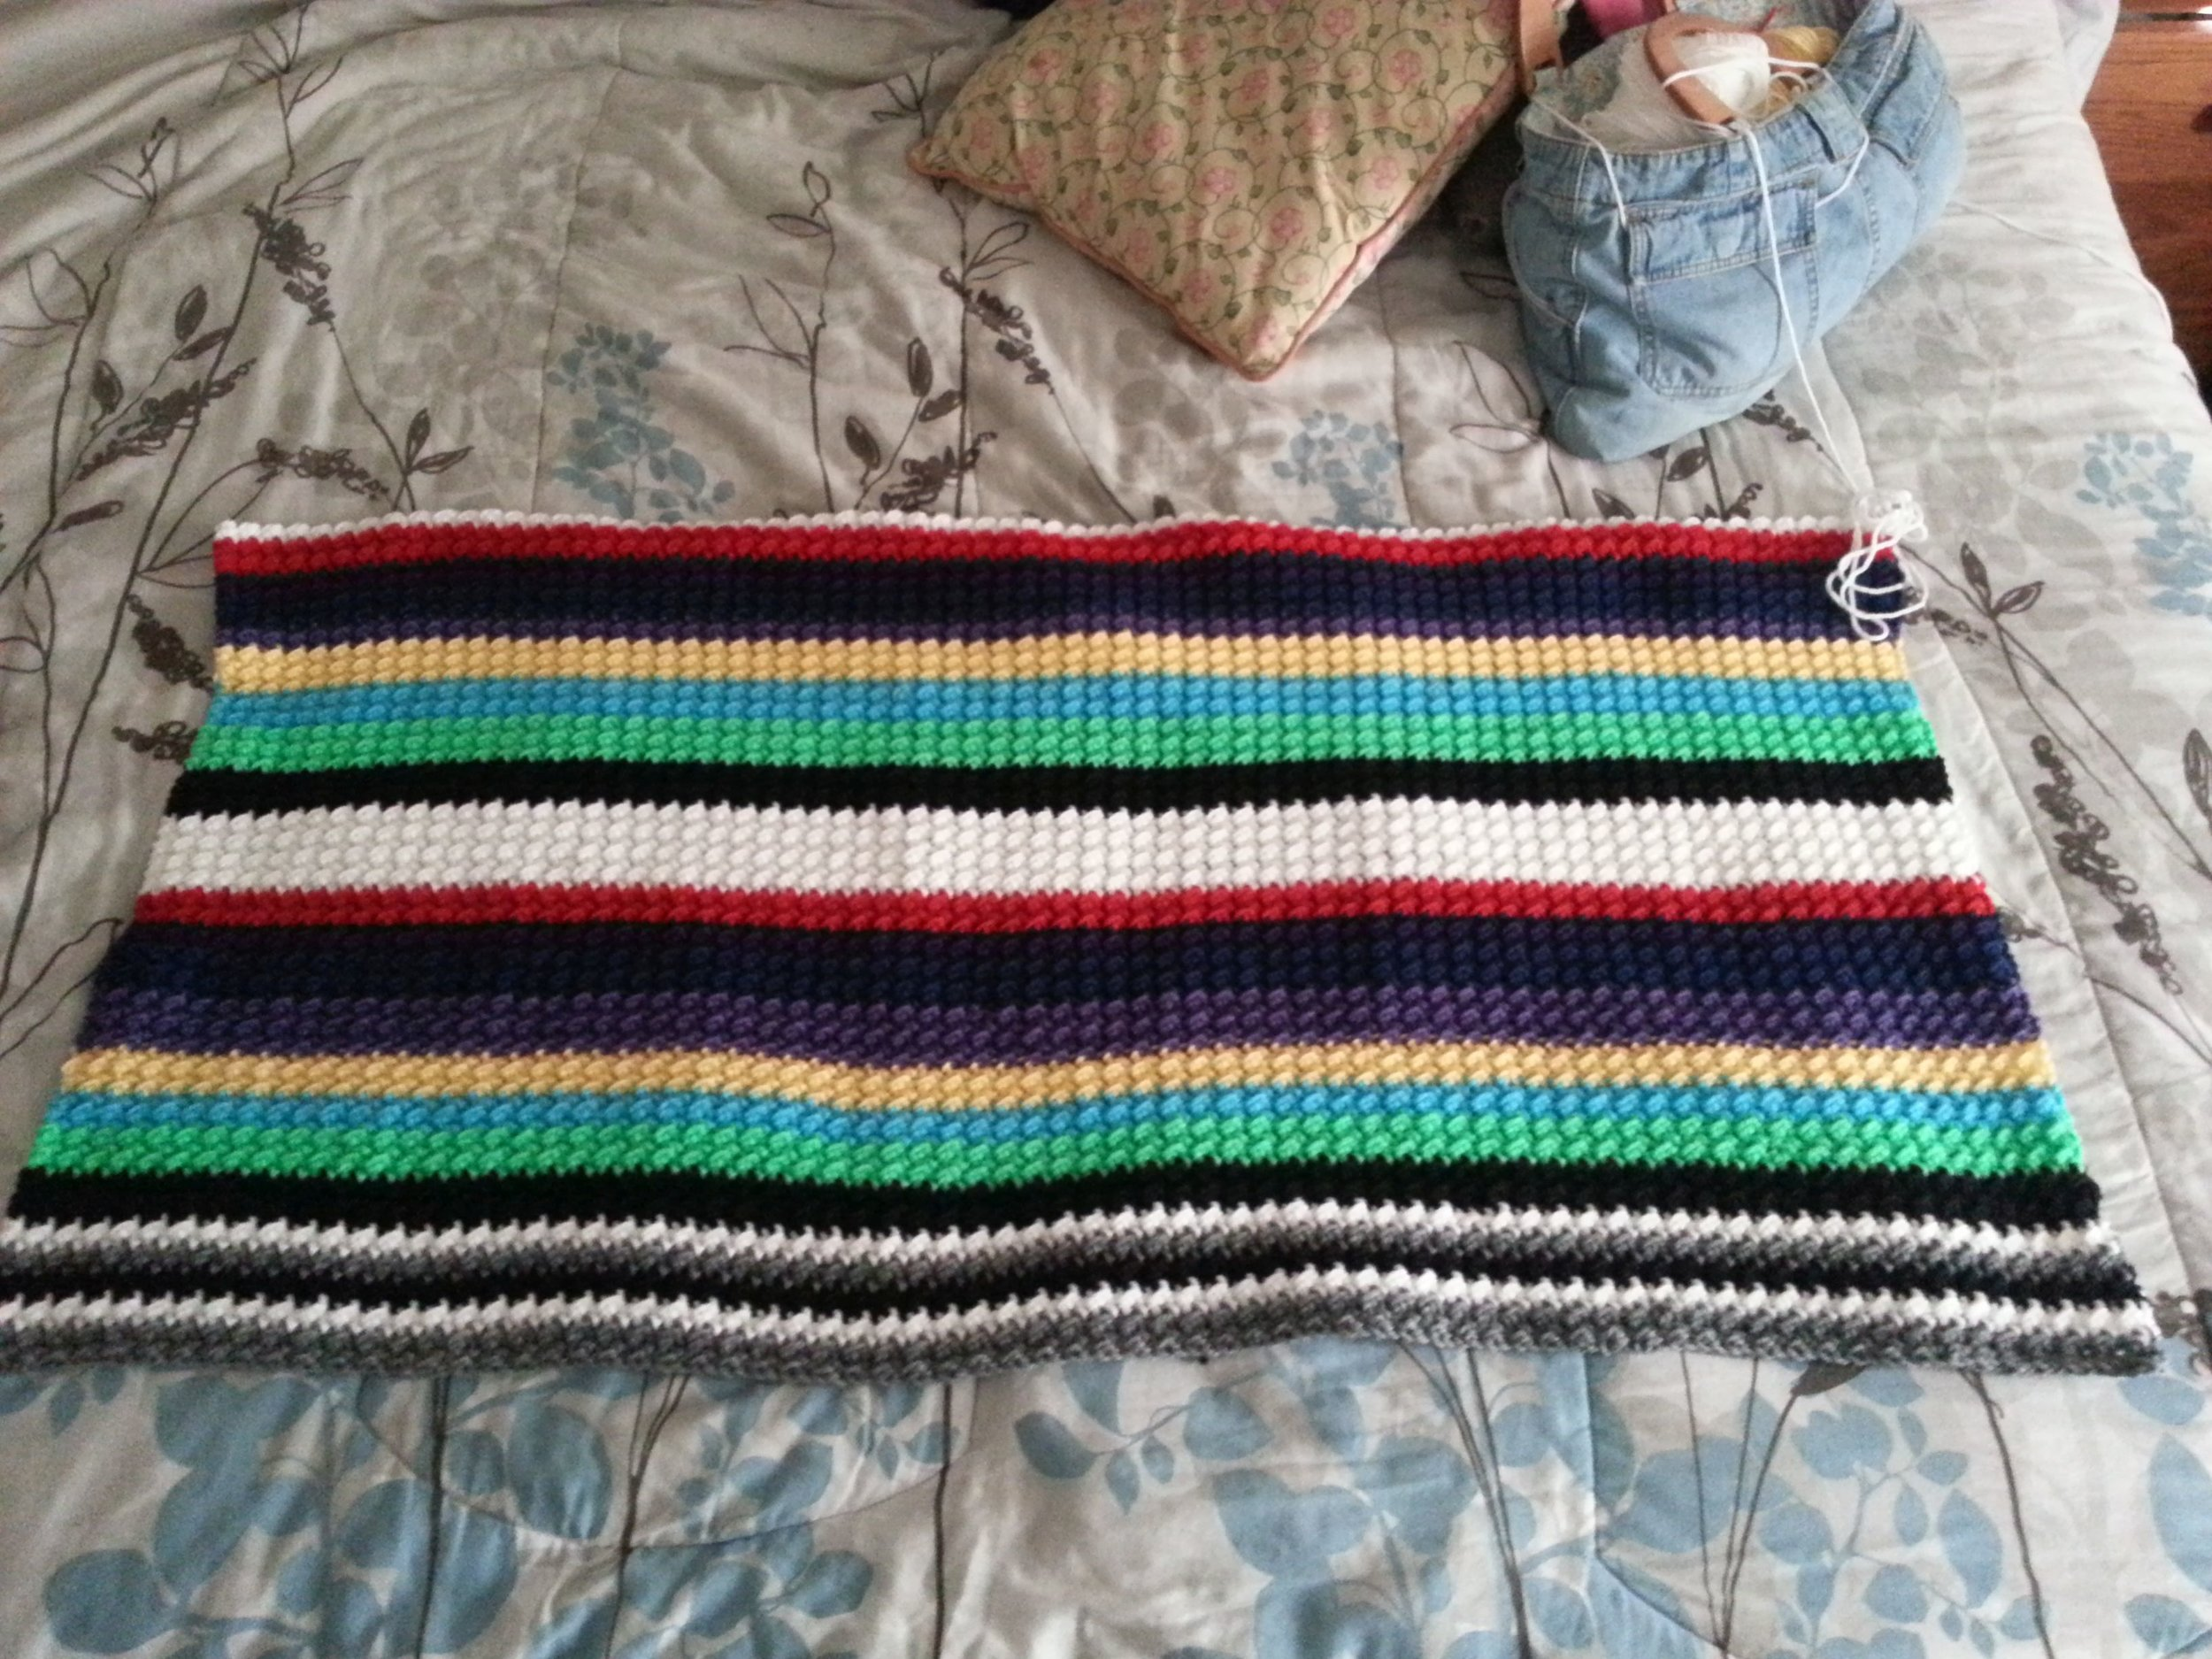 Crochet Sweater - The Cheat